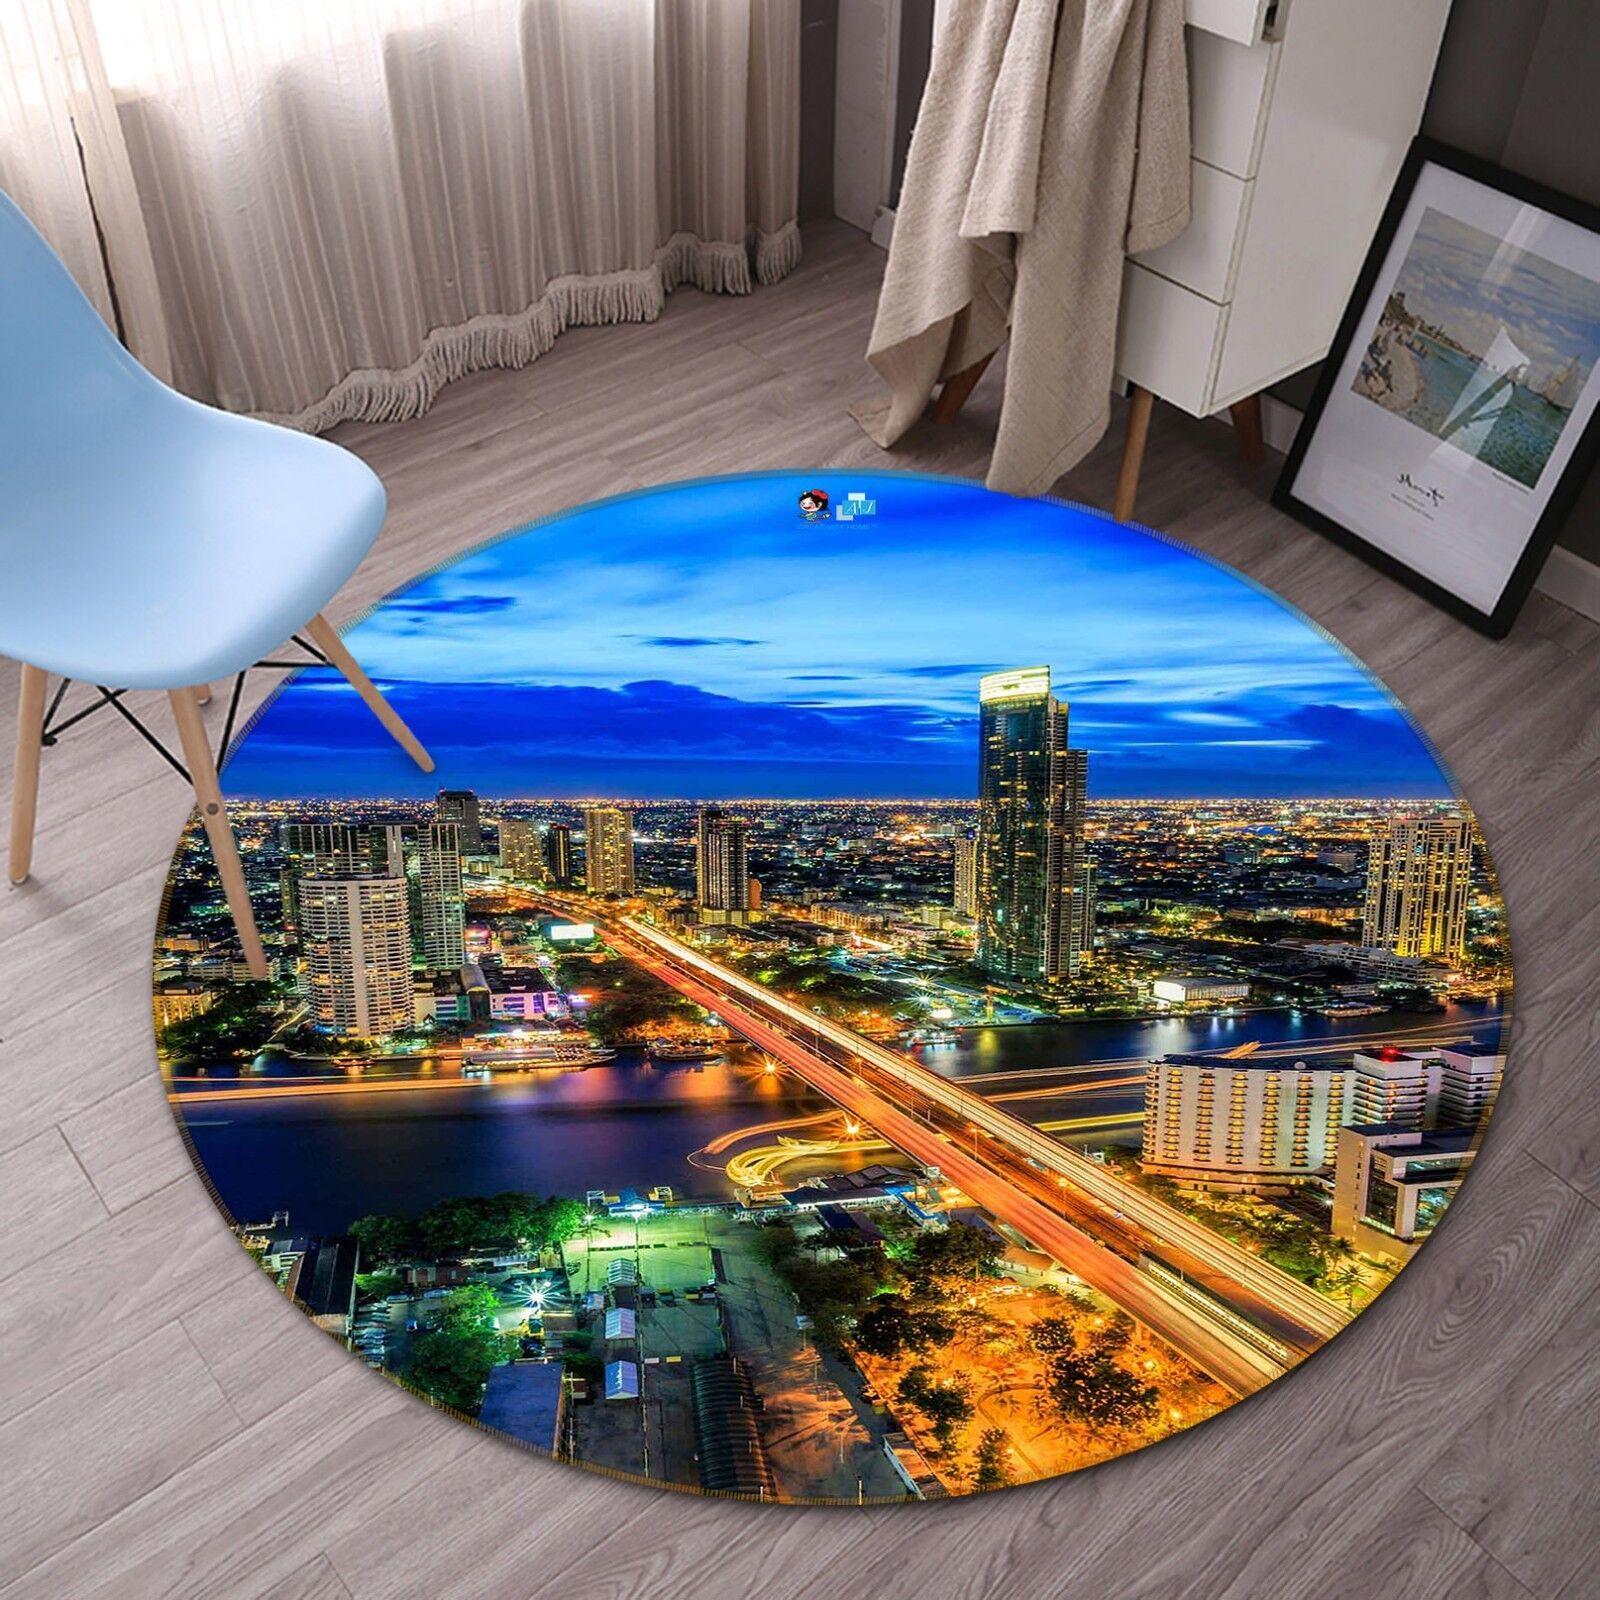 3D CITY BRIDGE 4 tappetino antiscivolo tappeto camera Tappetino Tondo Qualità Elegante foto Tappeto UK